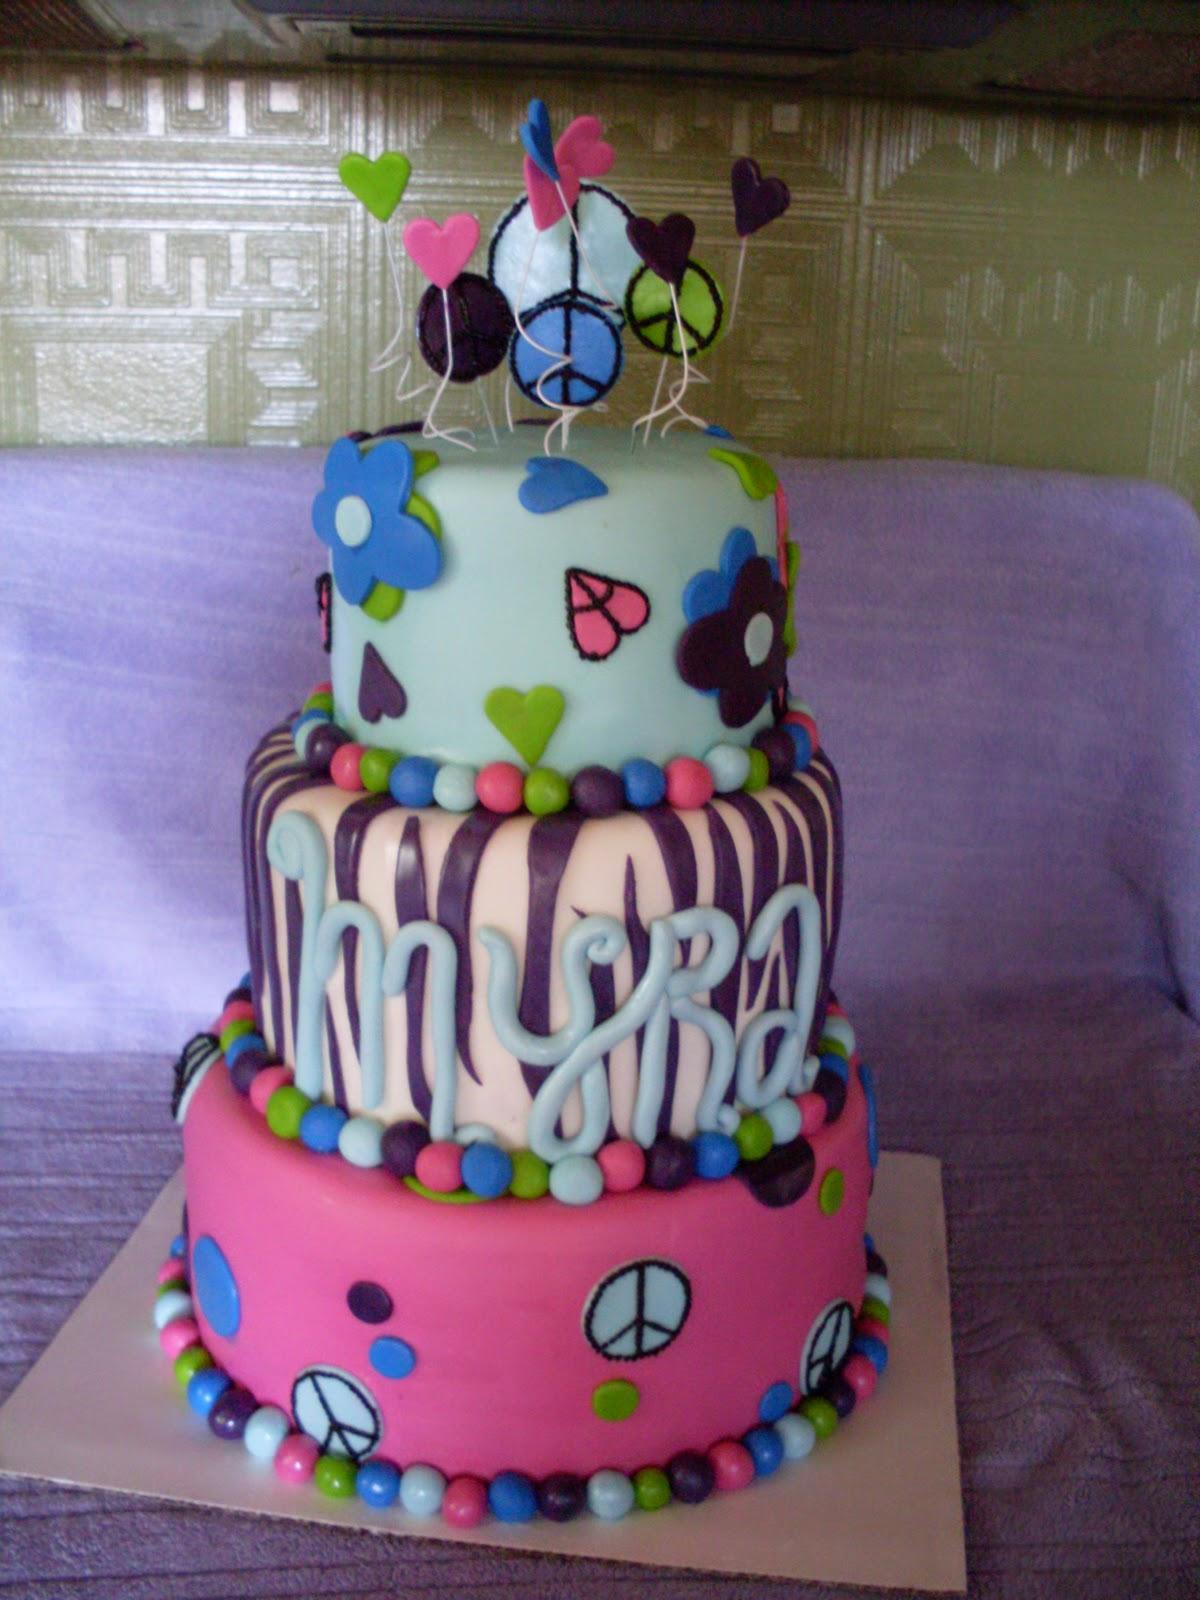 Happy 9th Birthday Cake